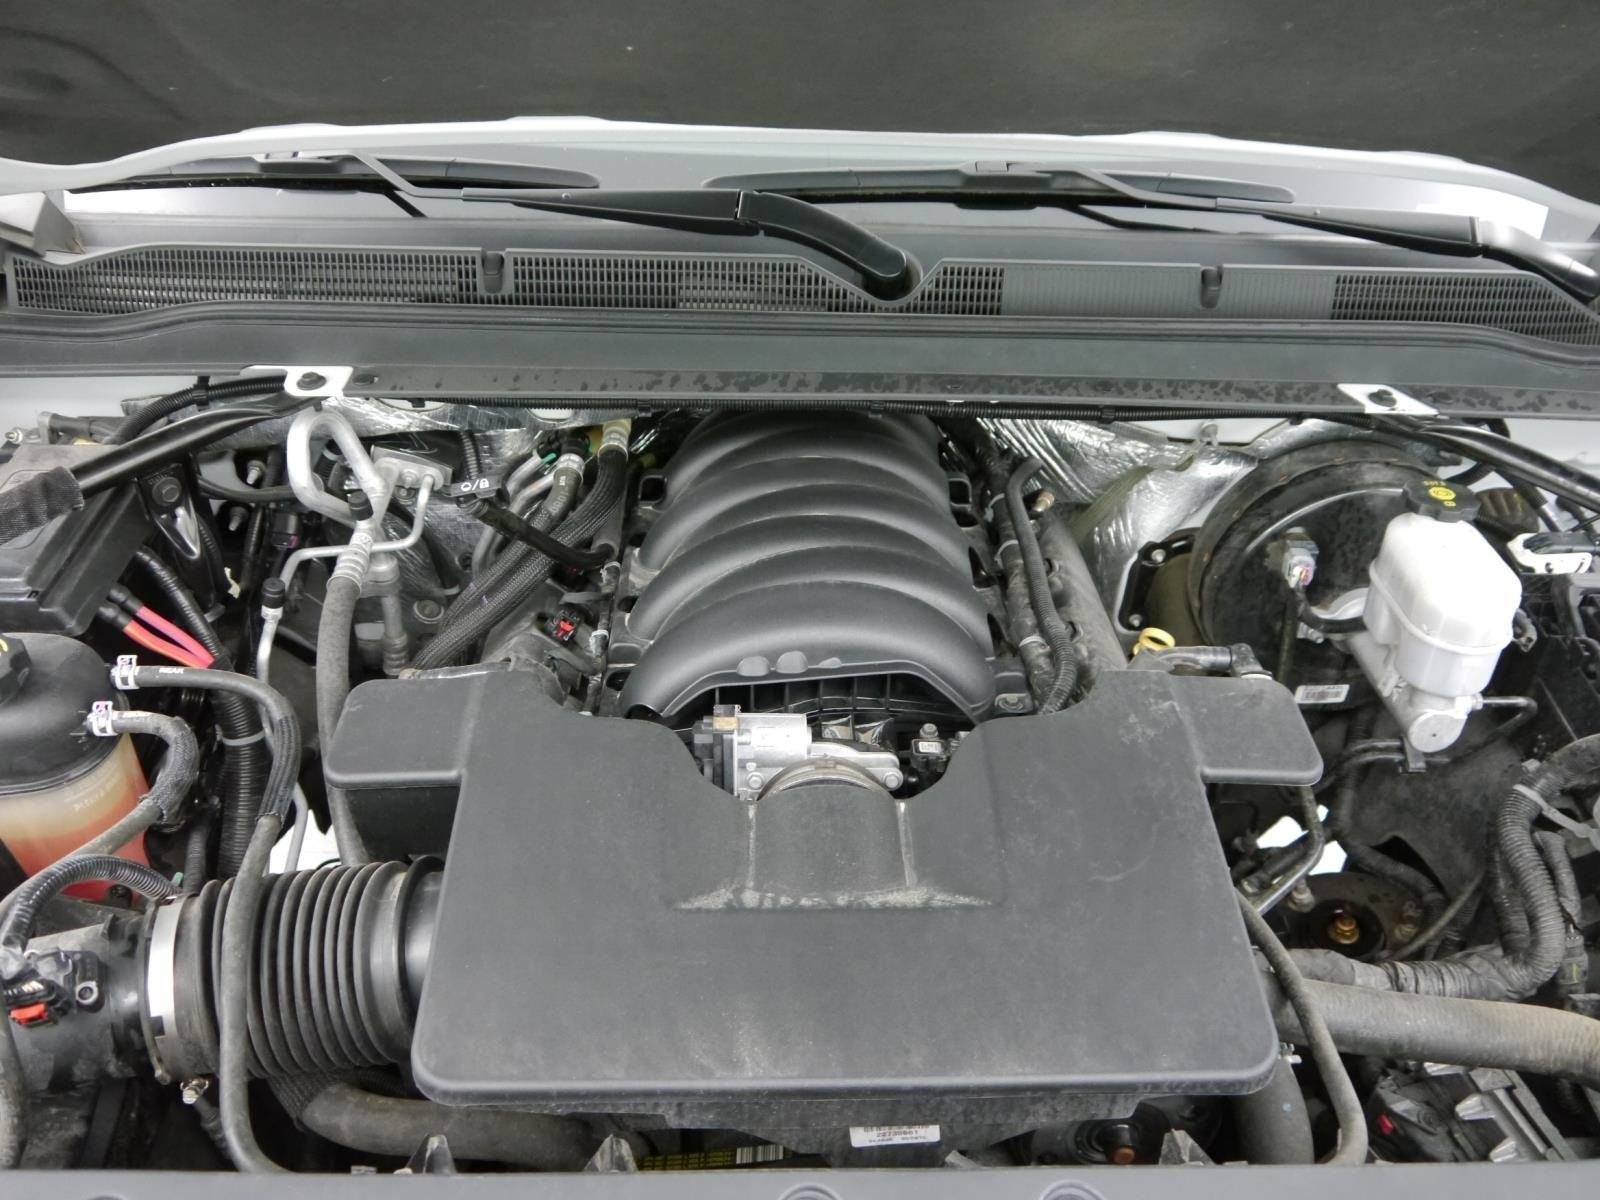 Gmc Yukon Parts Diagram Pre Owned 2015 Gmc Yukon Sle Sport Utility ...